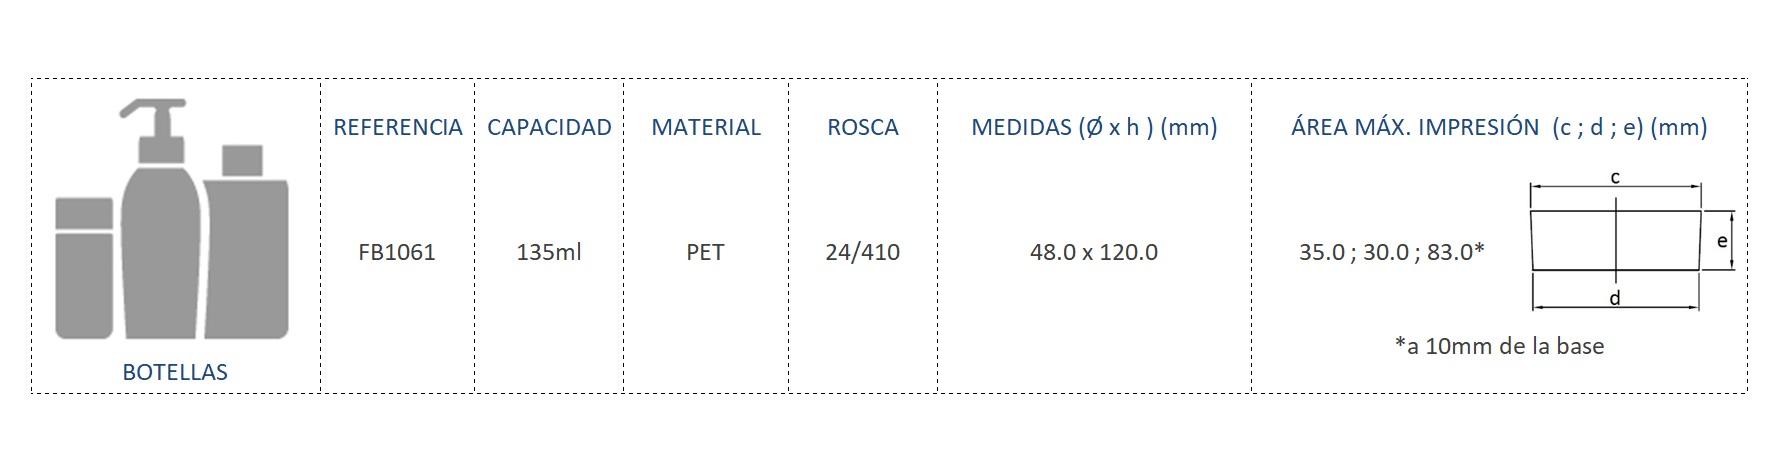 Cuadro de materiales botella FB1061